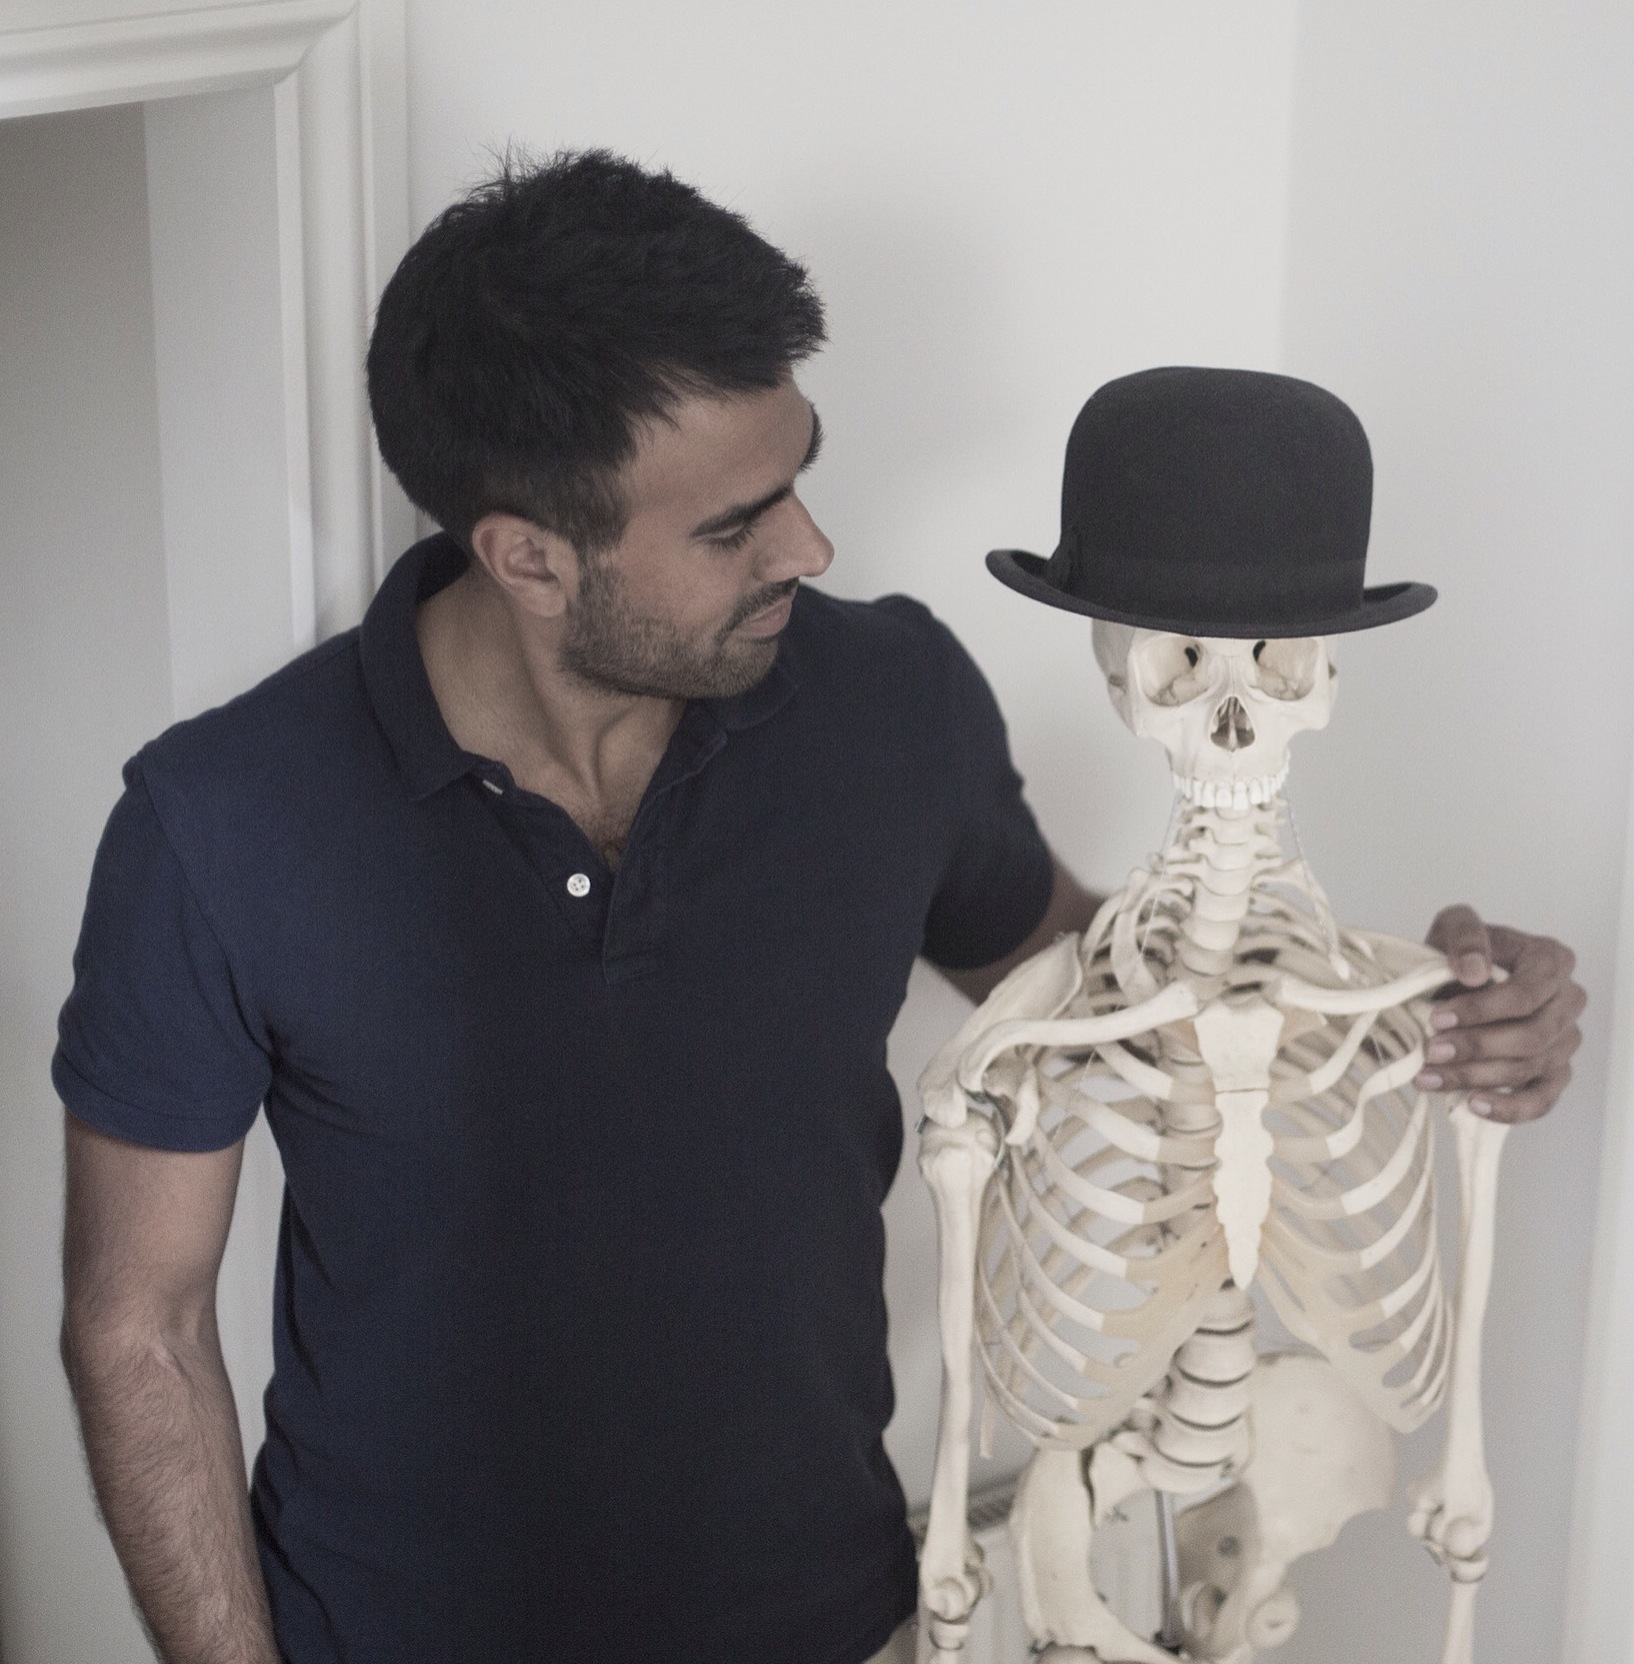 Posture Assessments